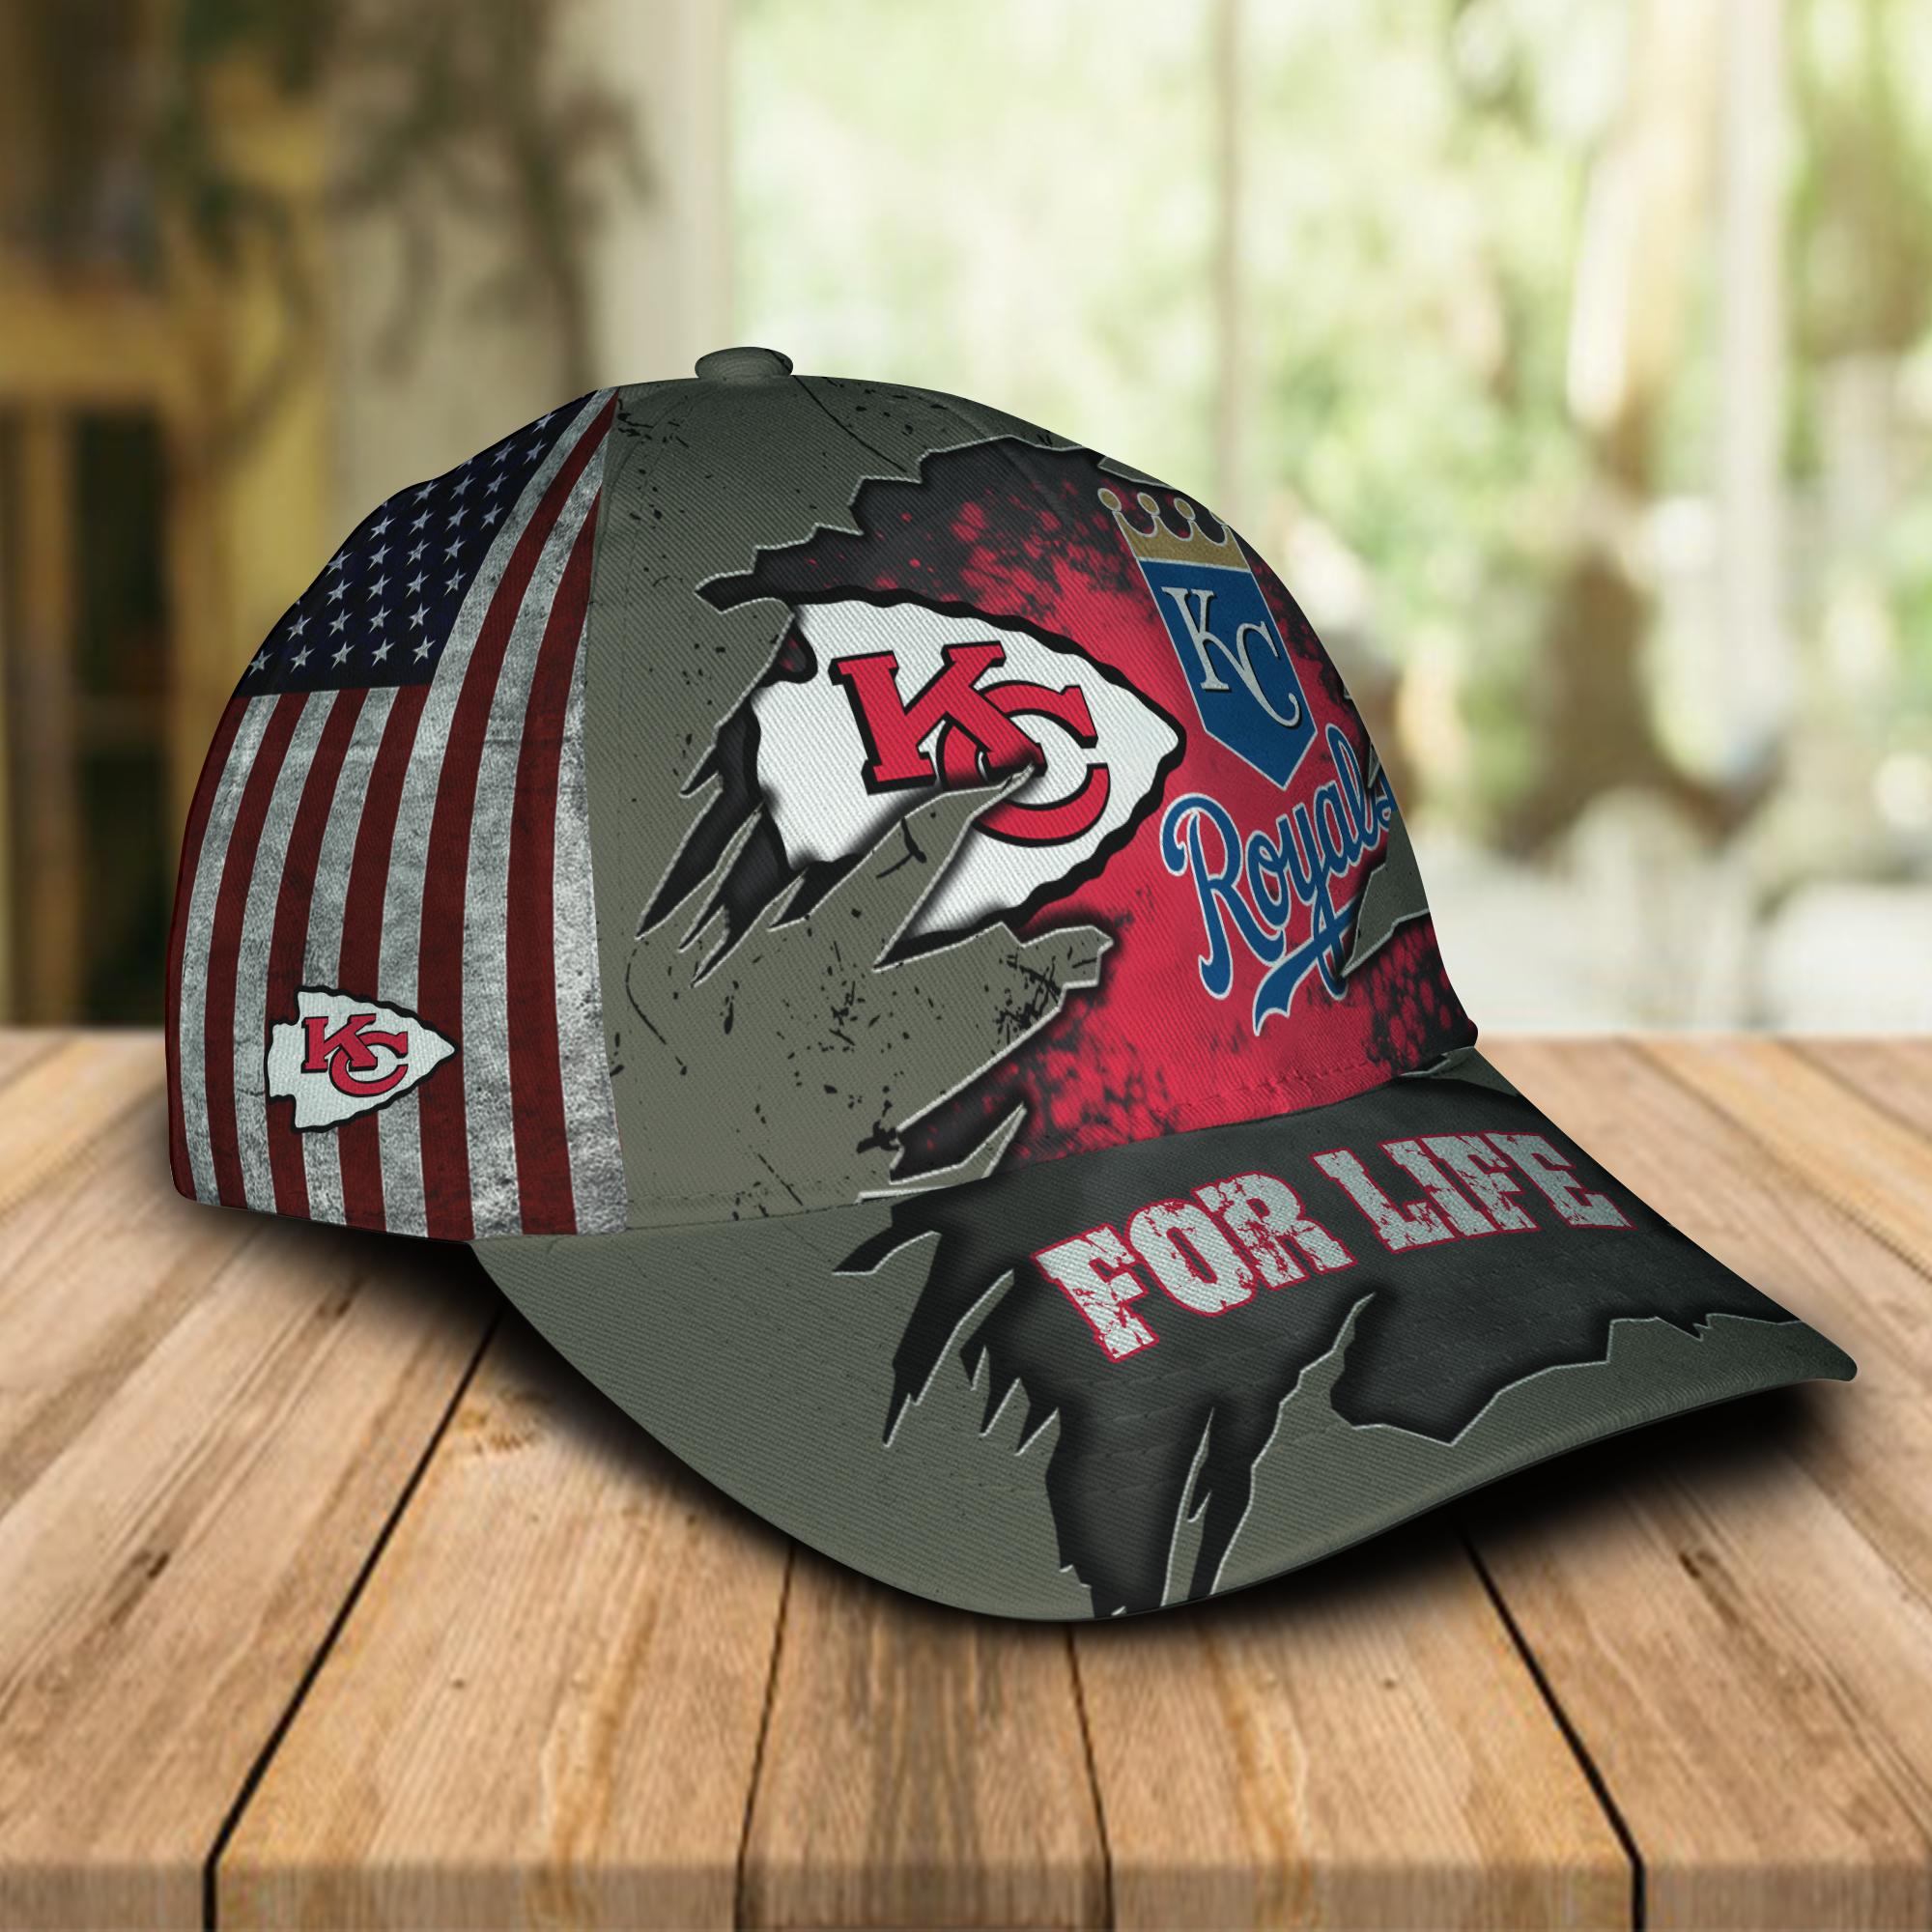 Kansas City Chiefs and Kansas City Royals For Life Hat Cap -